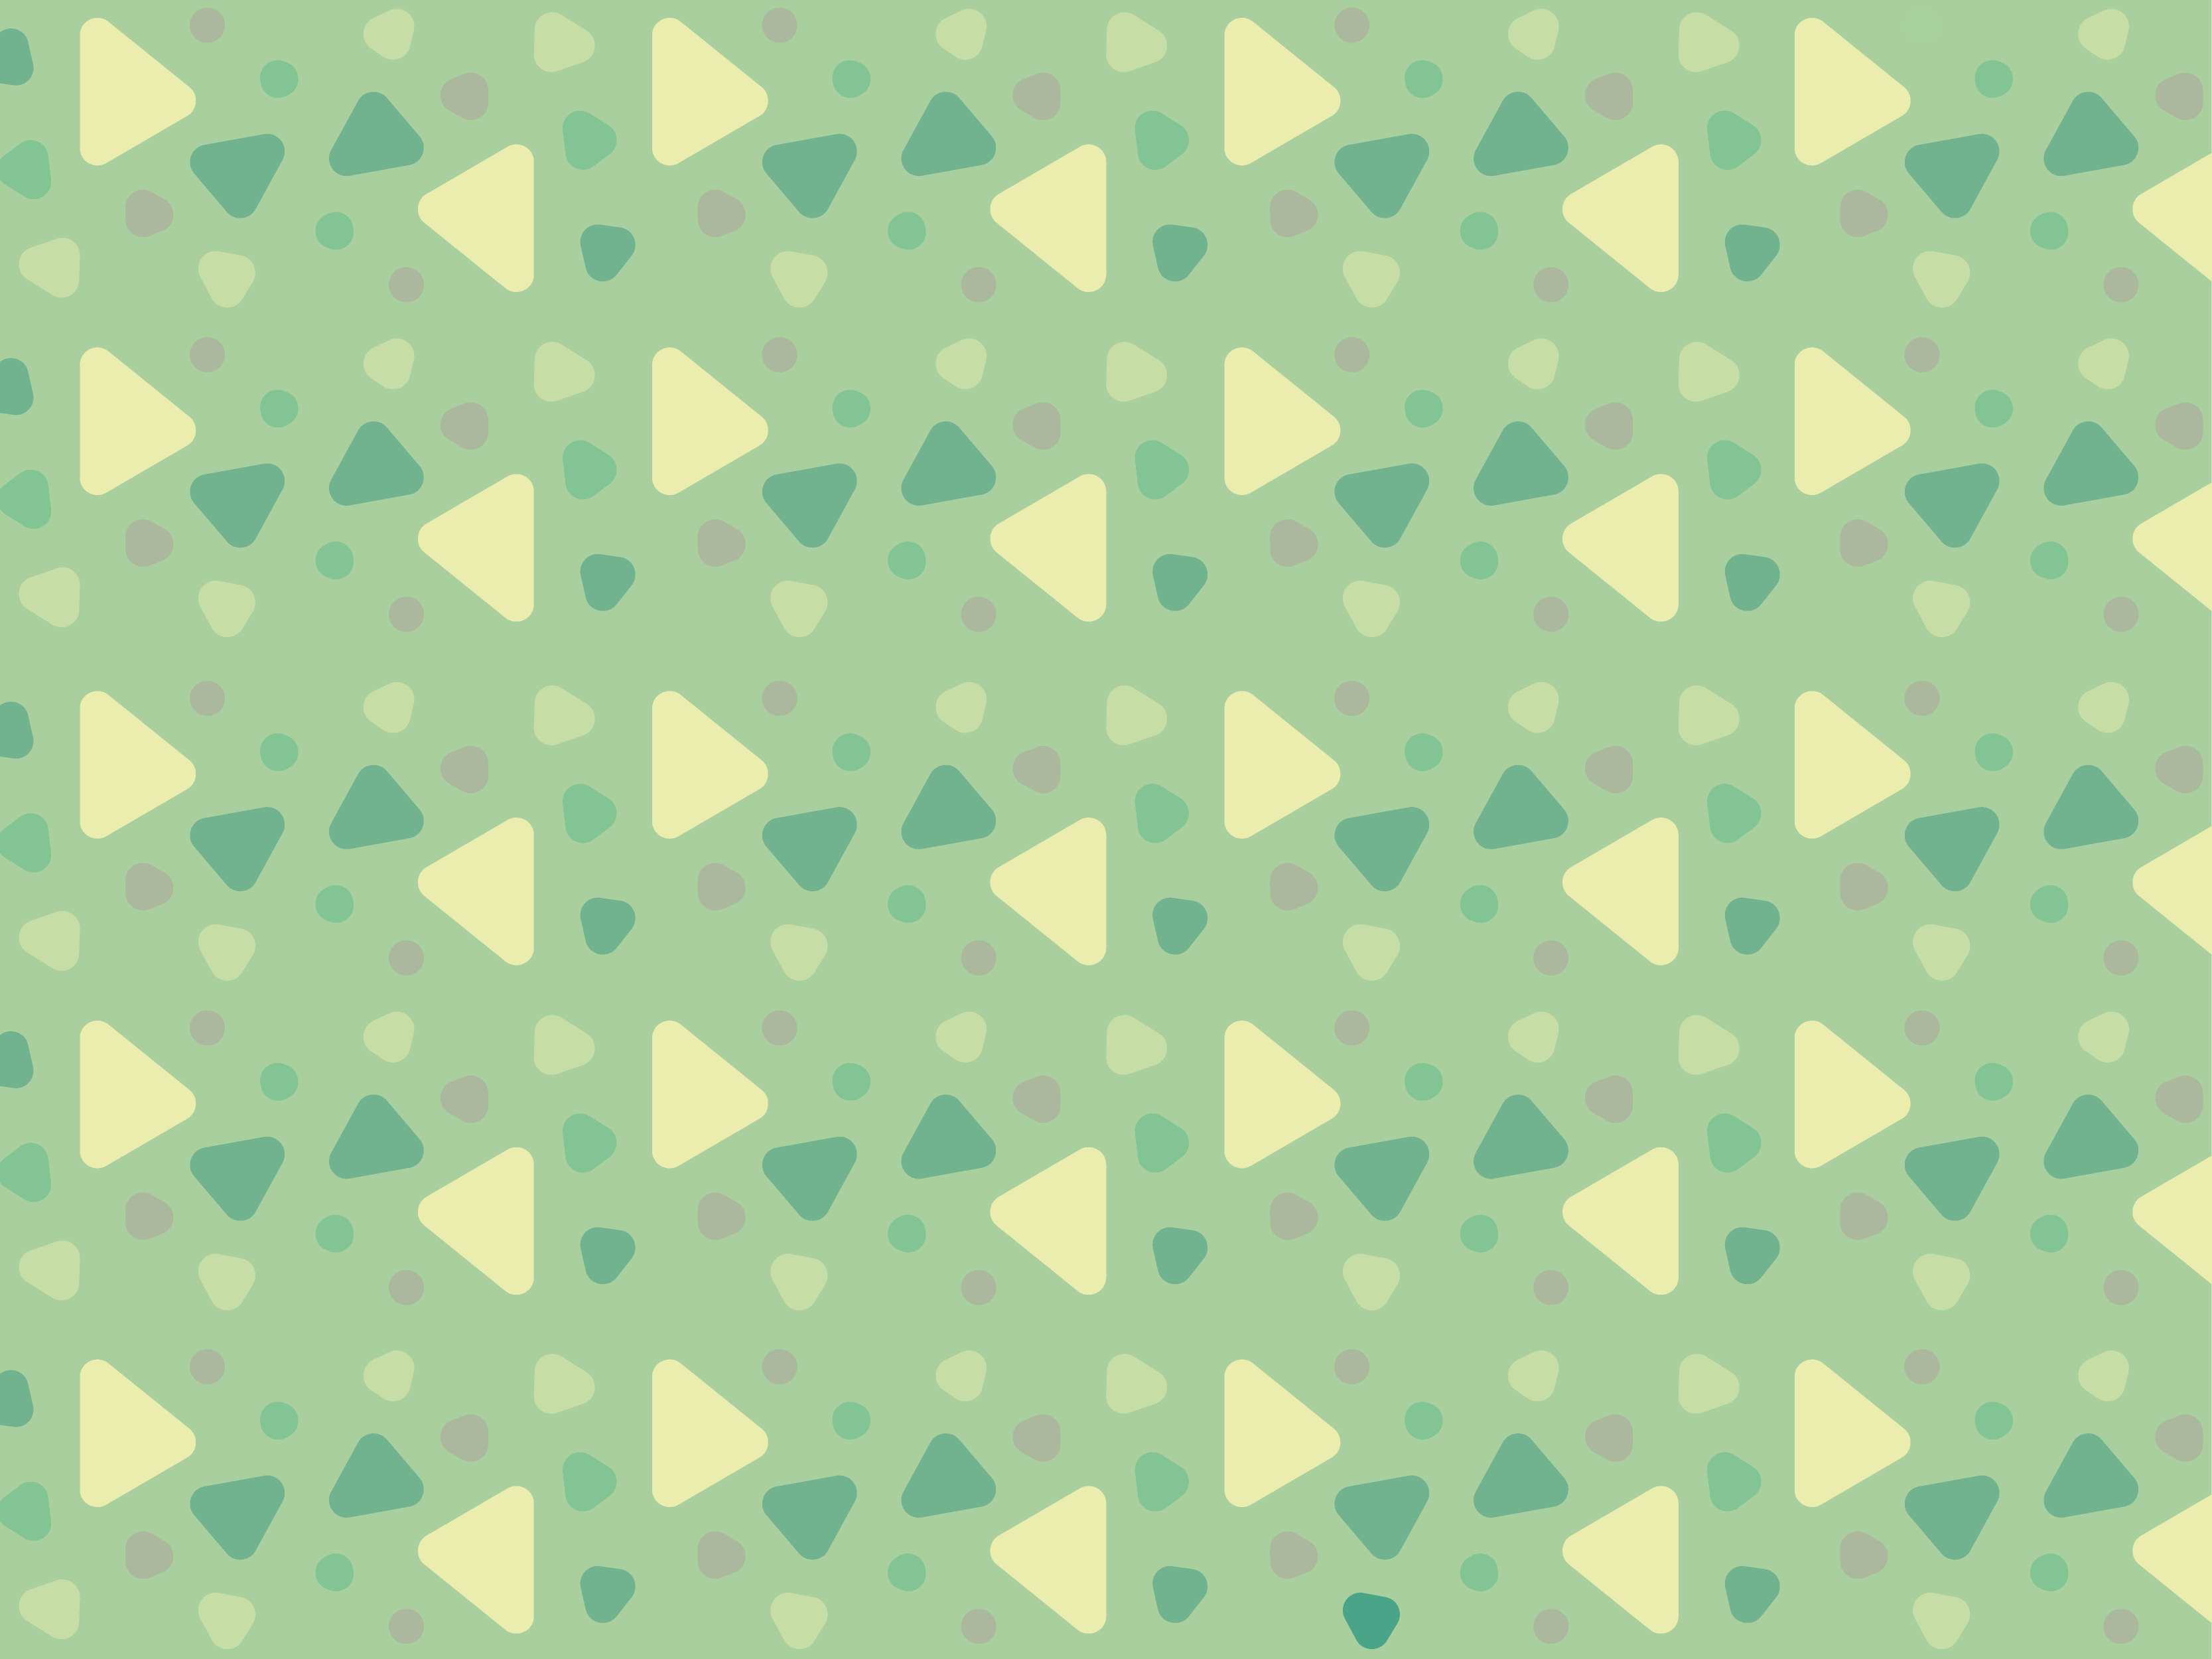 AC Pattern 2-01